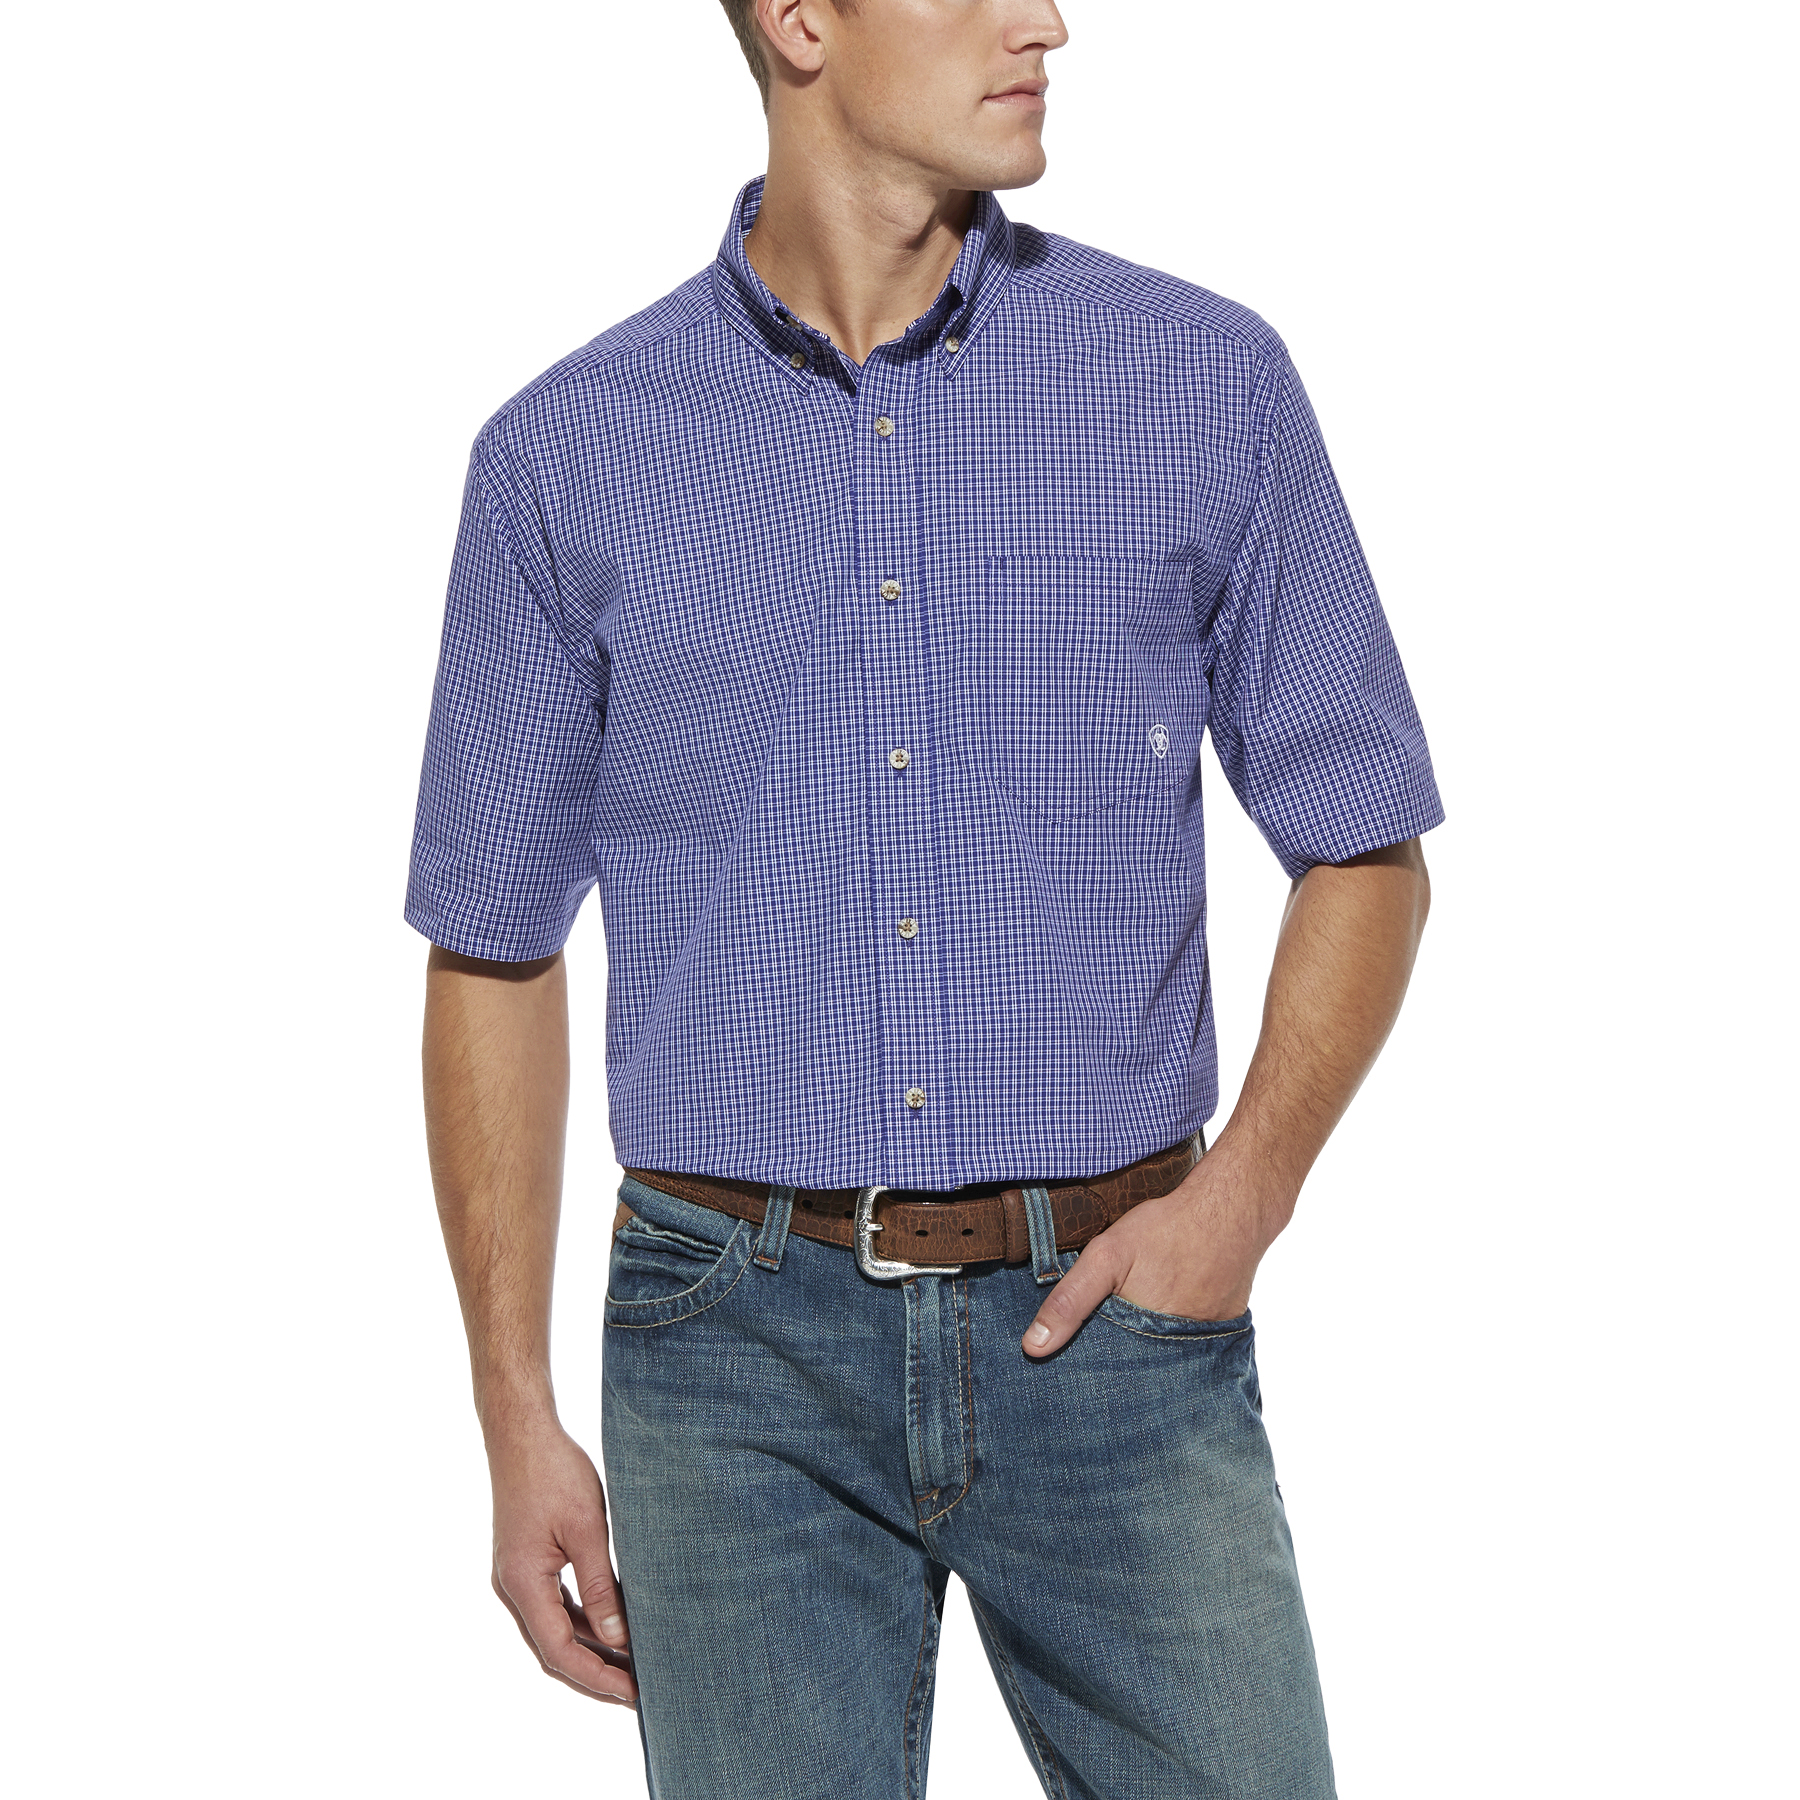 Ariat Tad Performance Short Sleeve Shirt